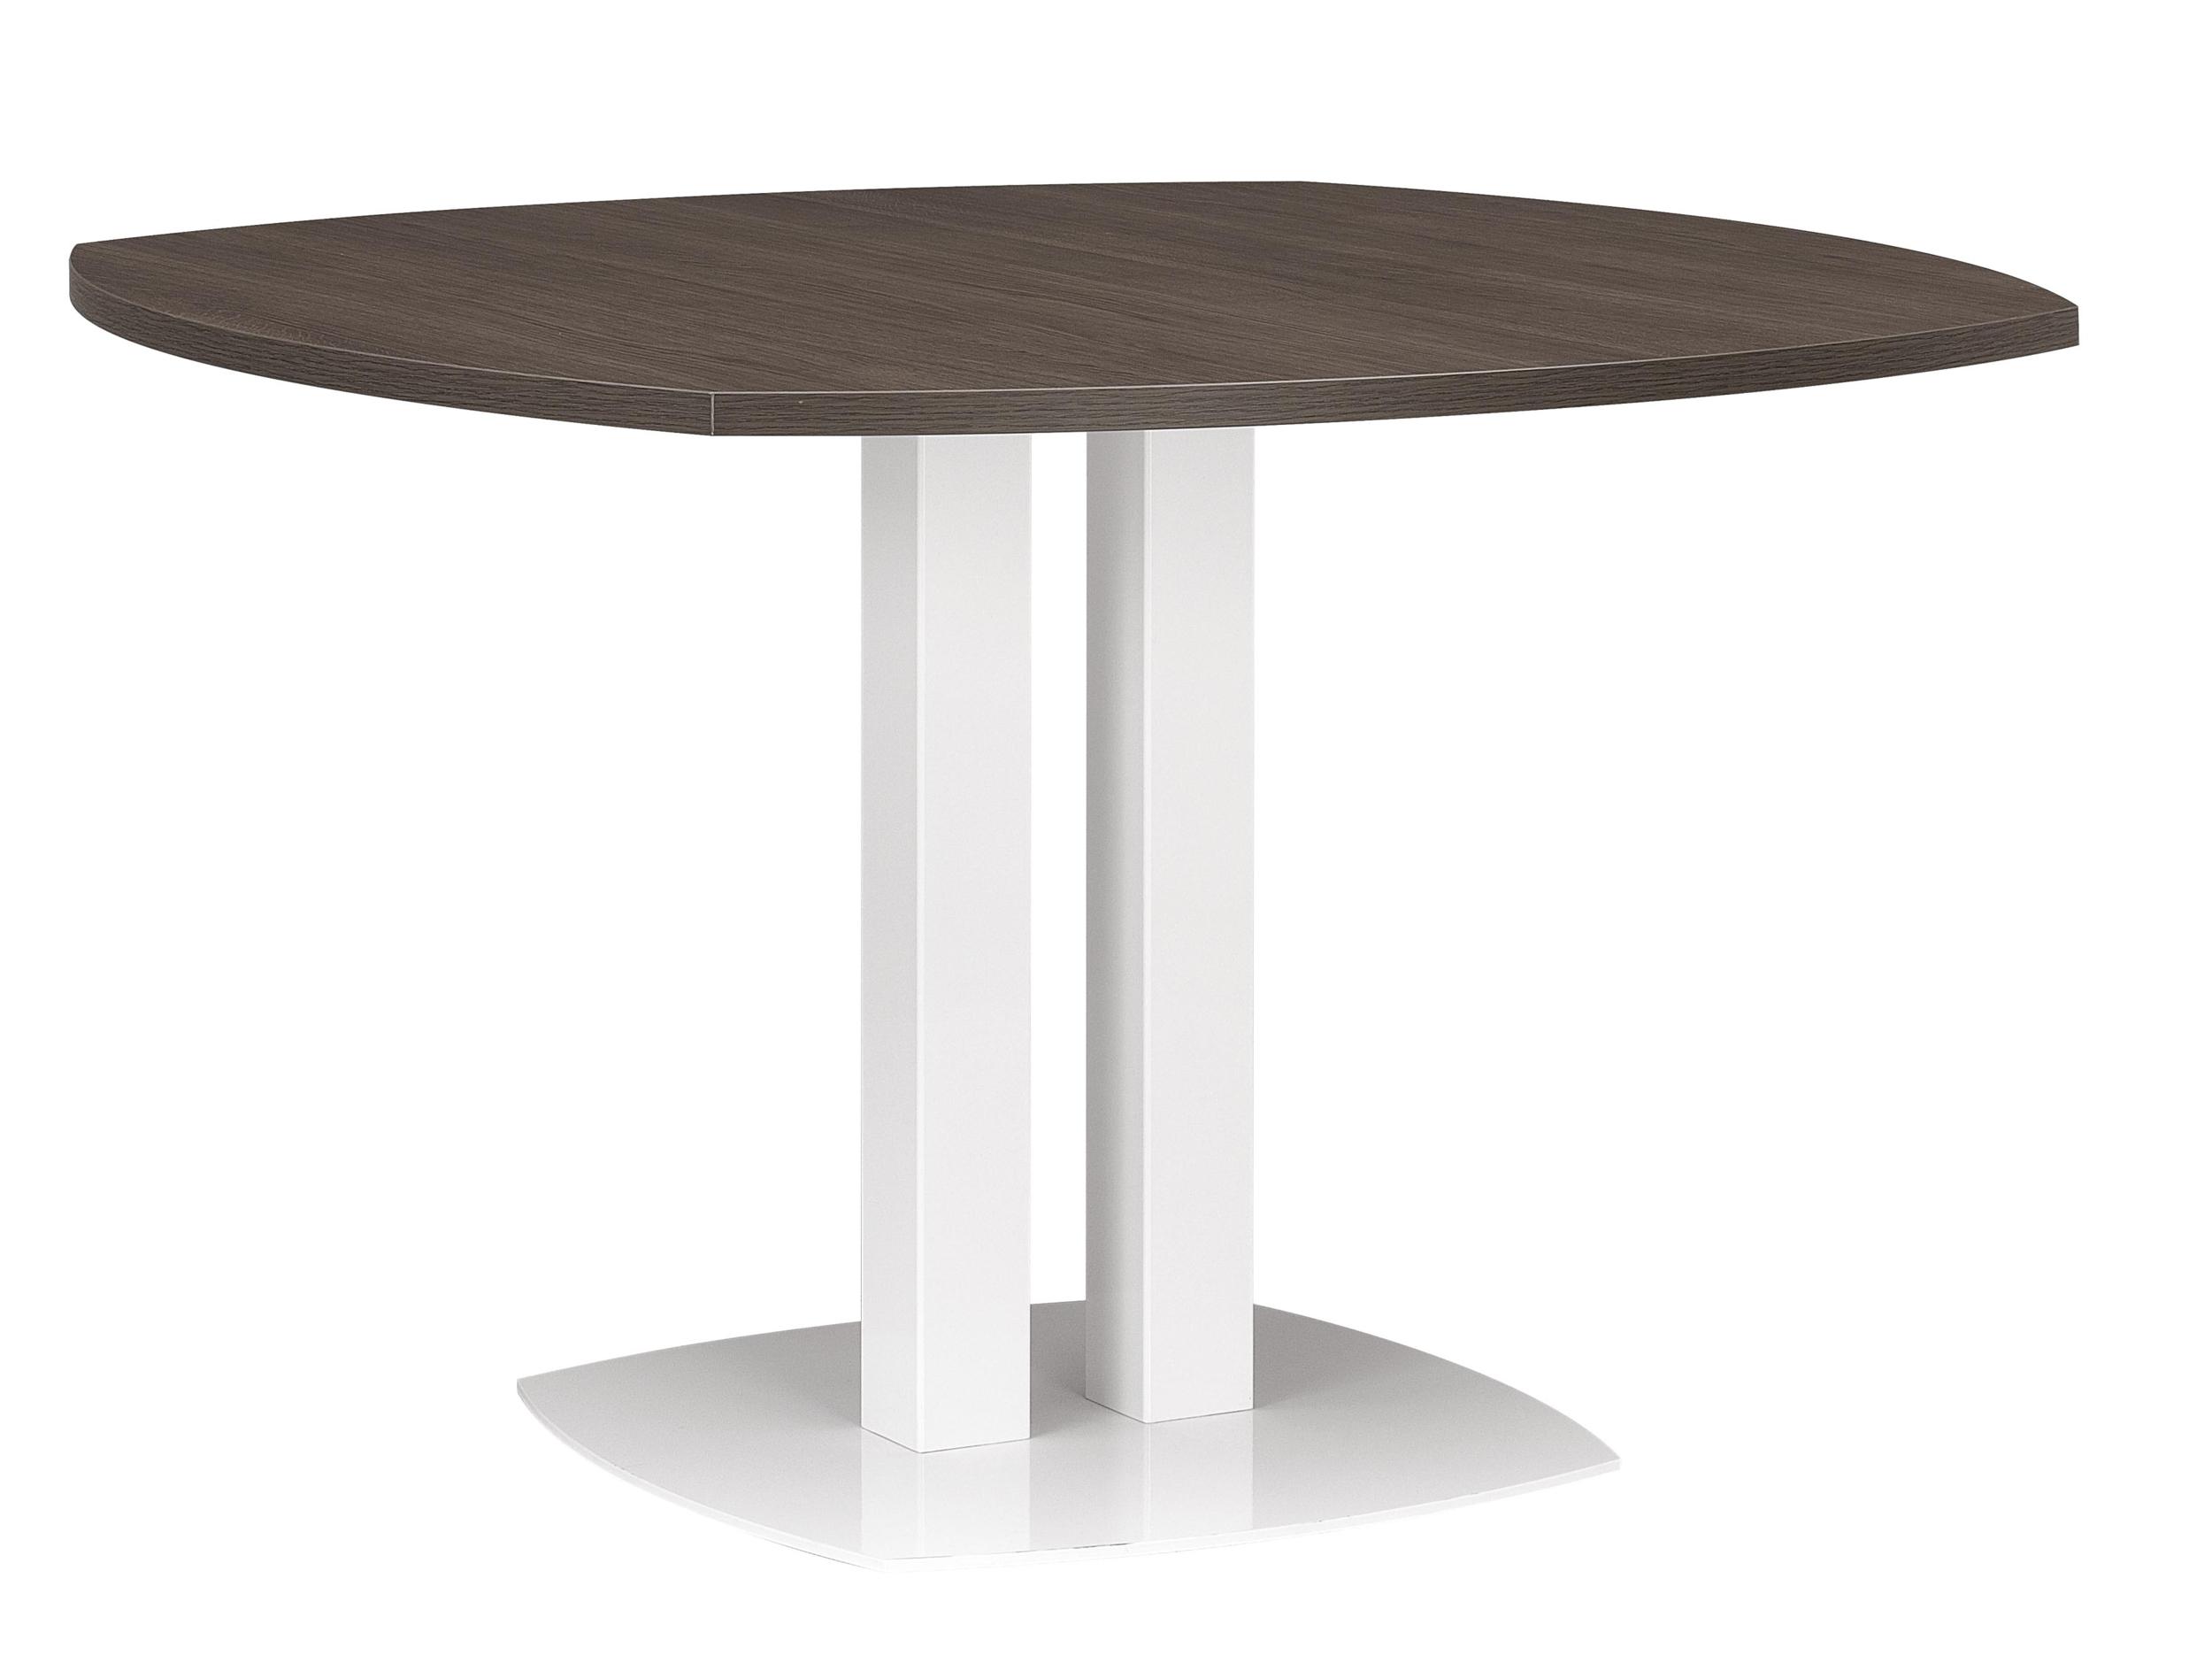 XENON CHÊNE TABLE COURBÉE PIED MÉTAL BLANC